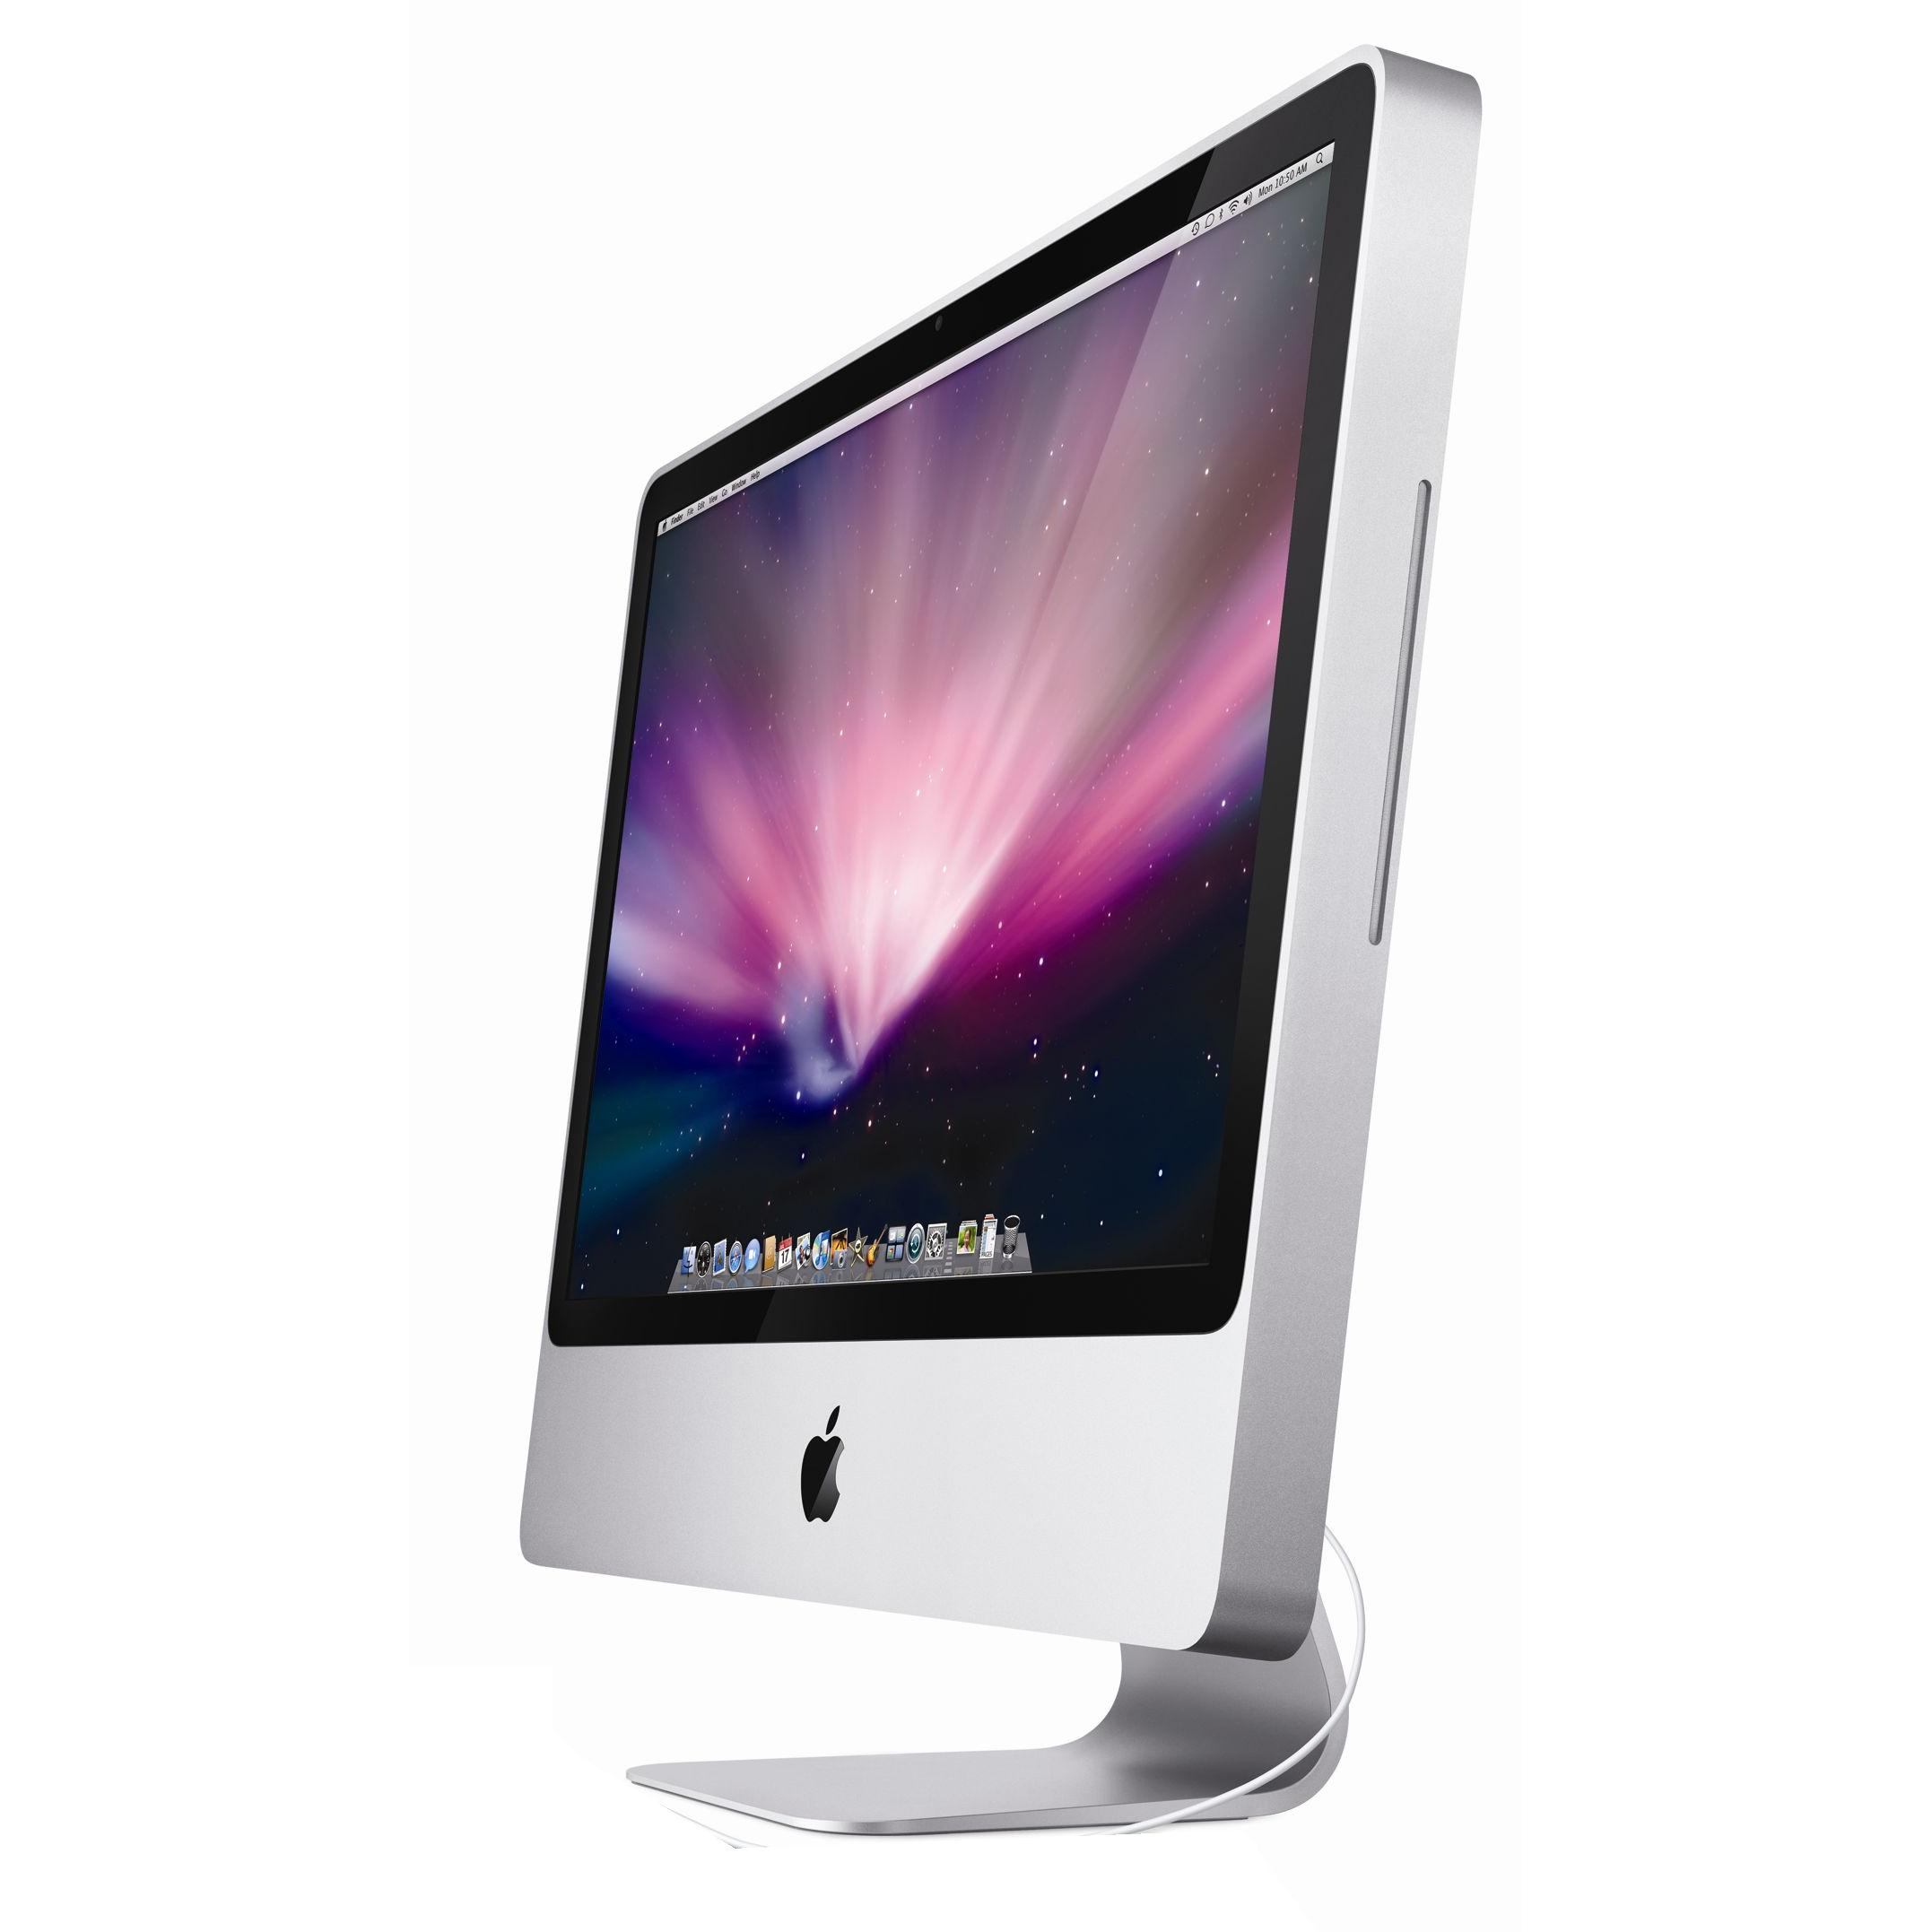 iMac 20-inch (Mid-2009) Core 2 Duo 2.26GHz - HDD 160 GB - 2GB